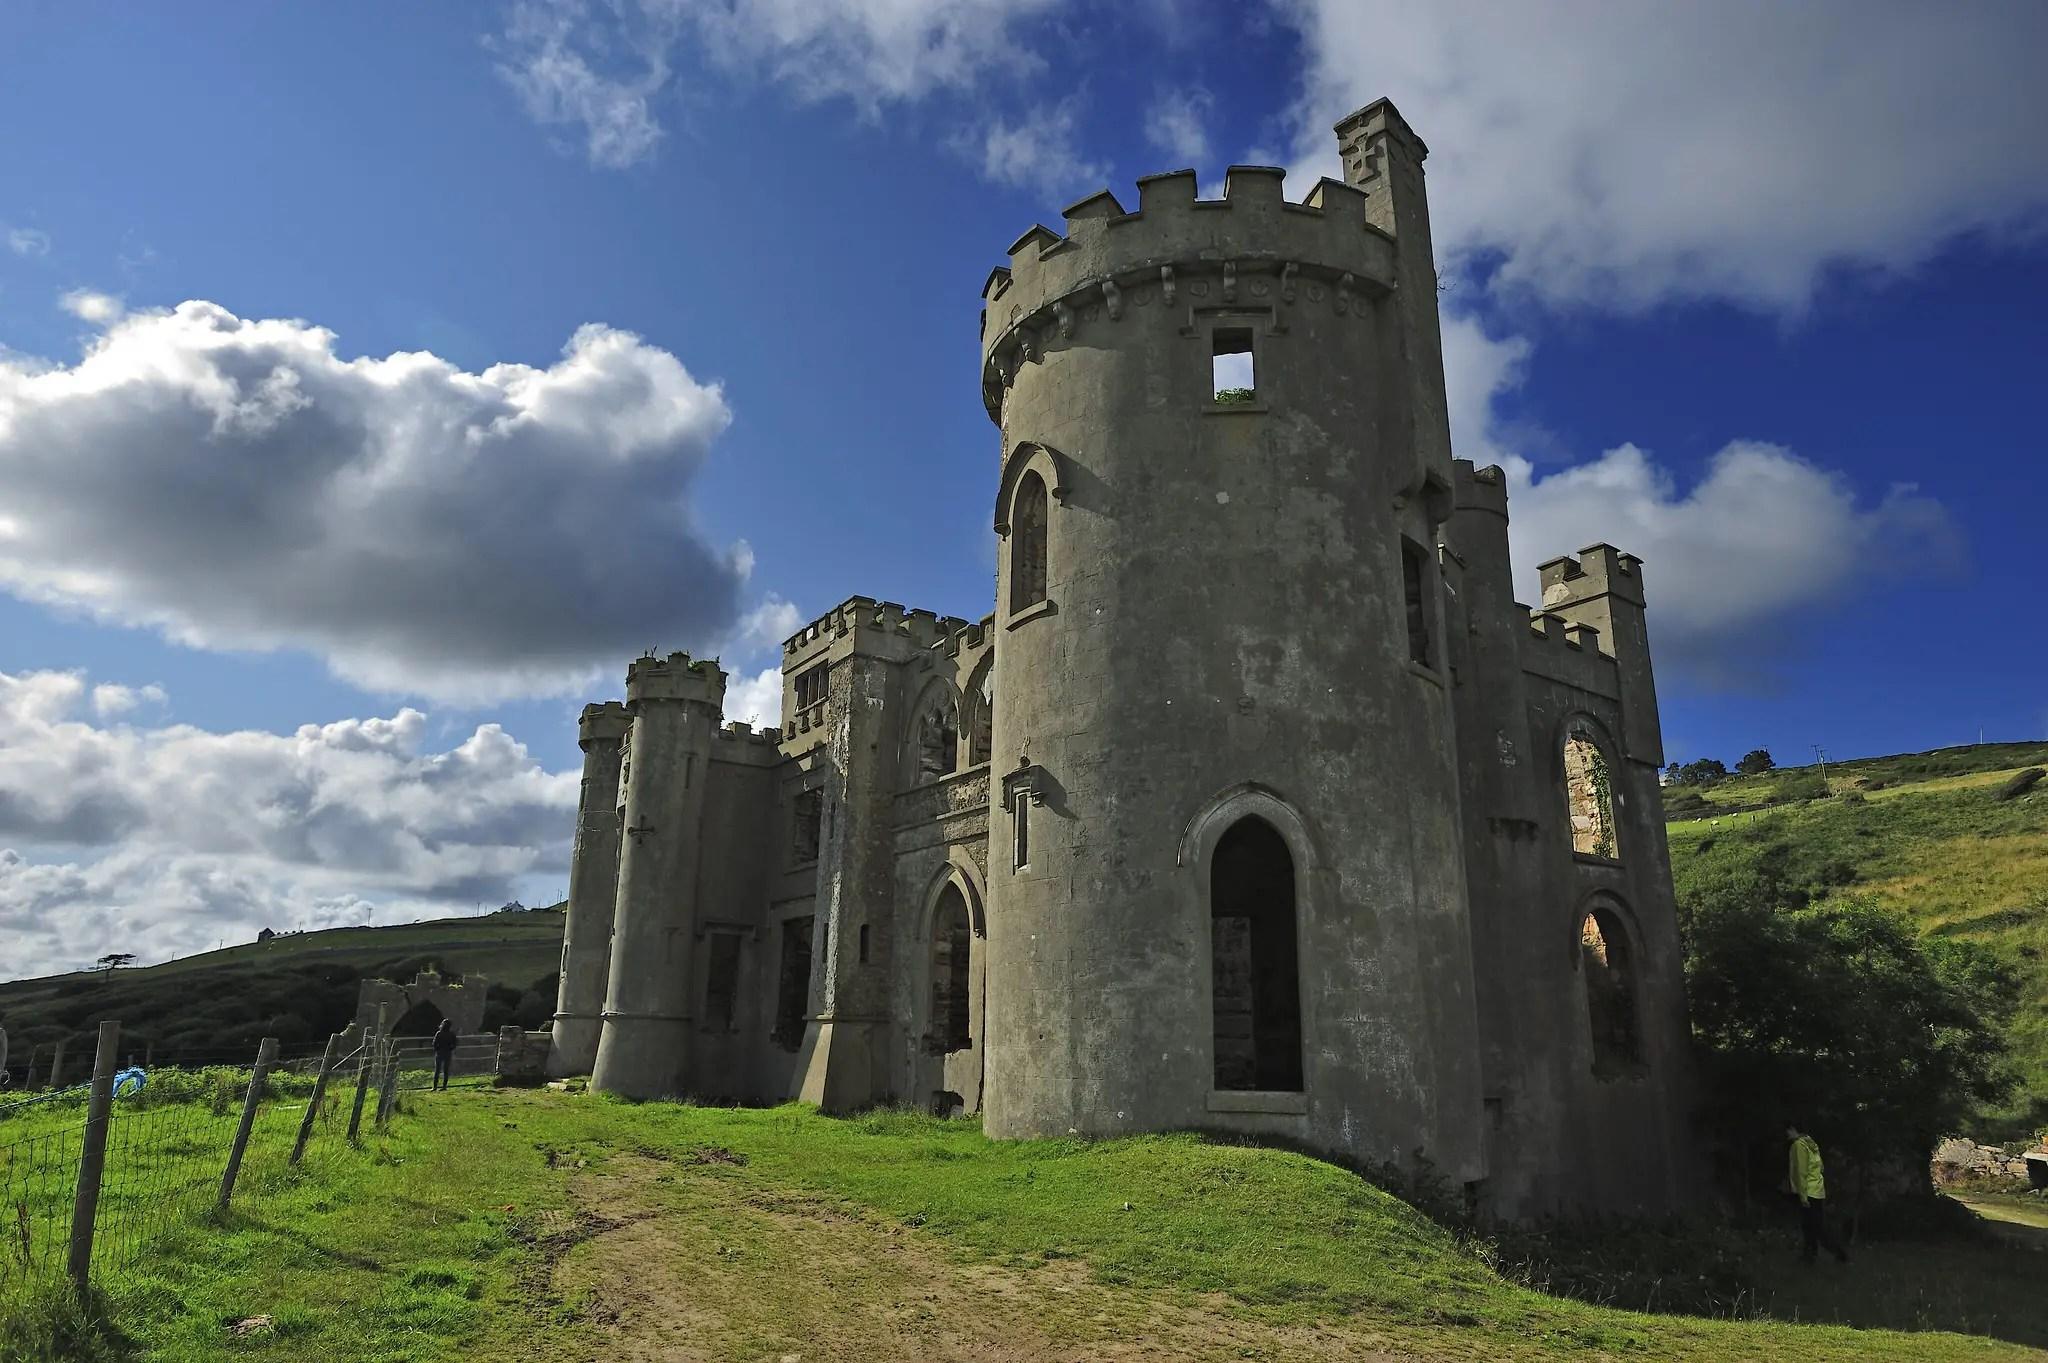 A tower at Clifden Castle